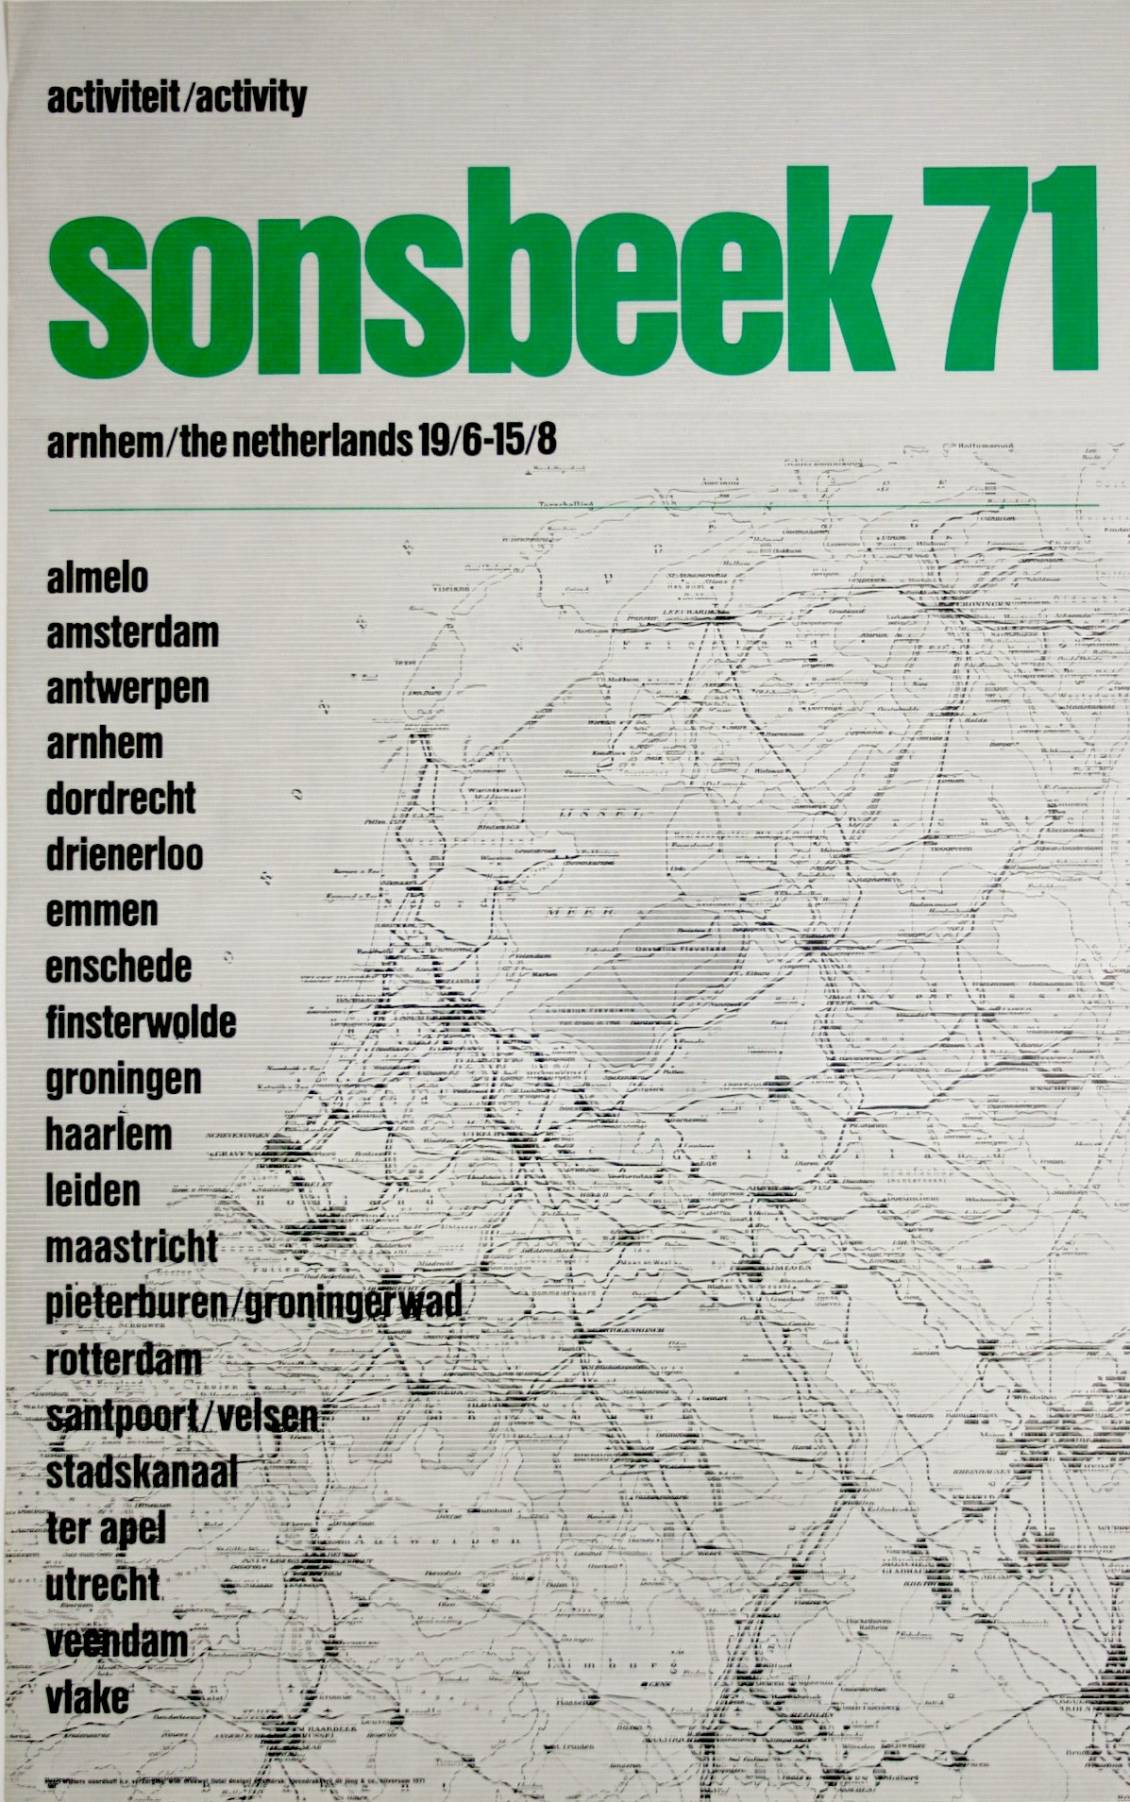 Poster 'Sonsbeek 71'